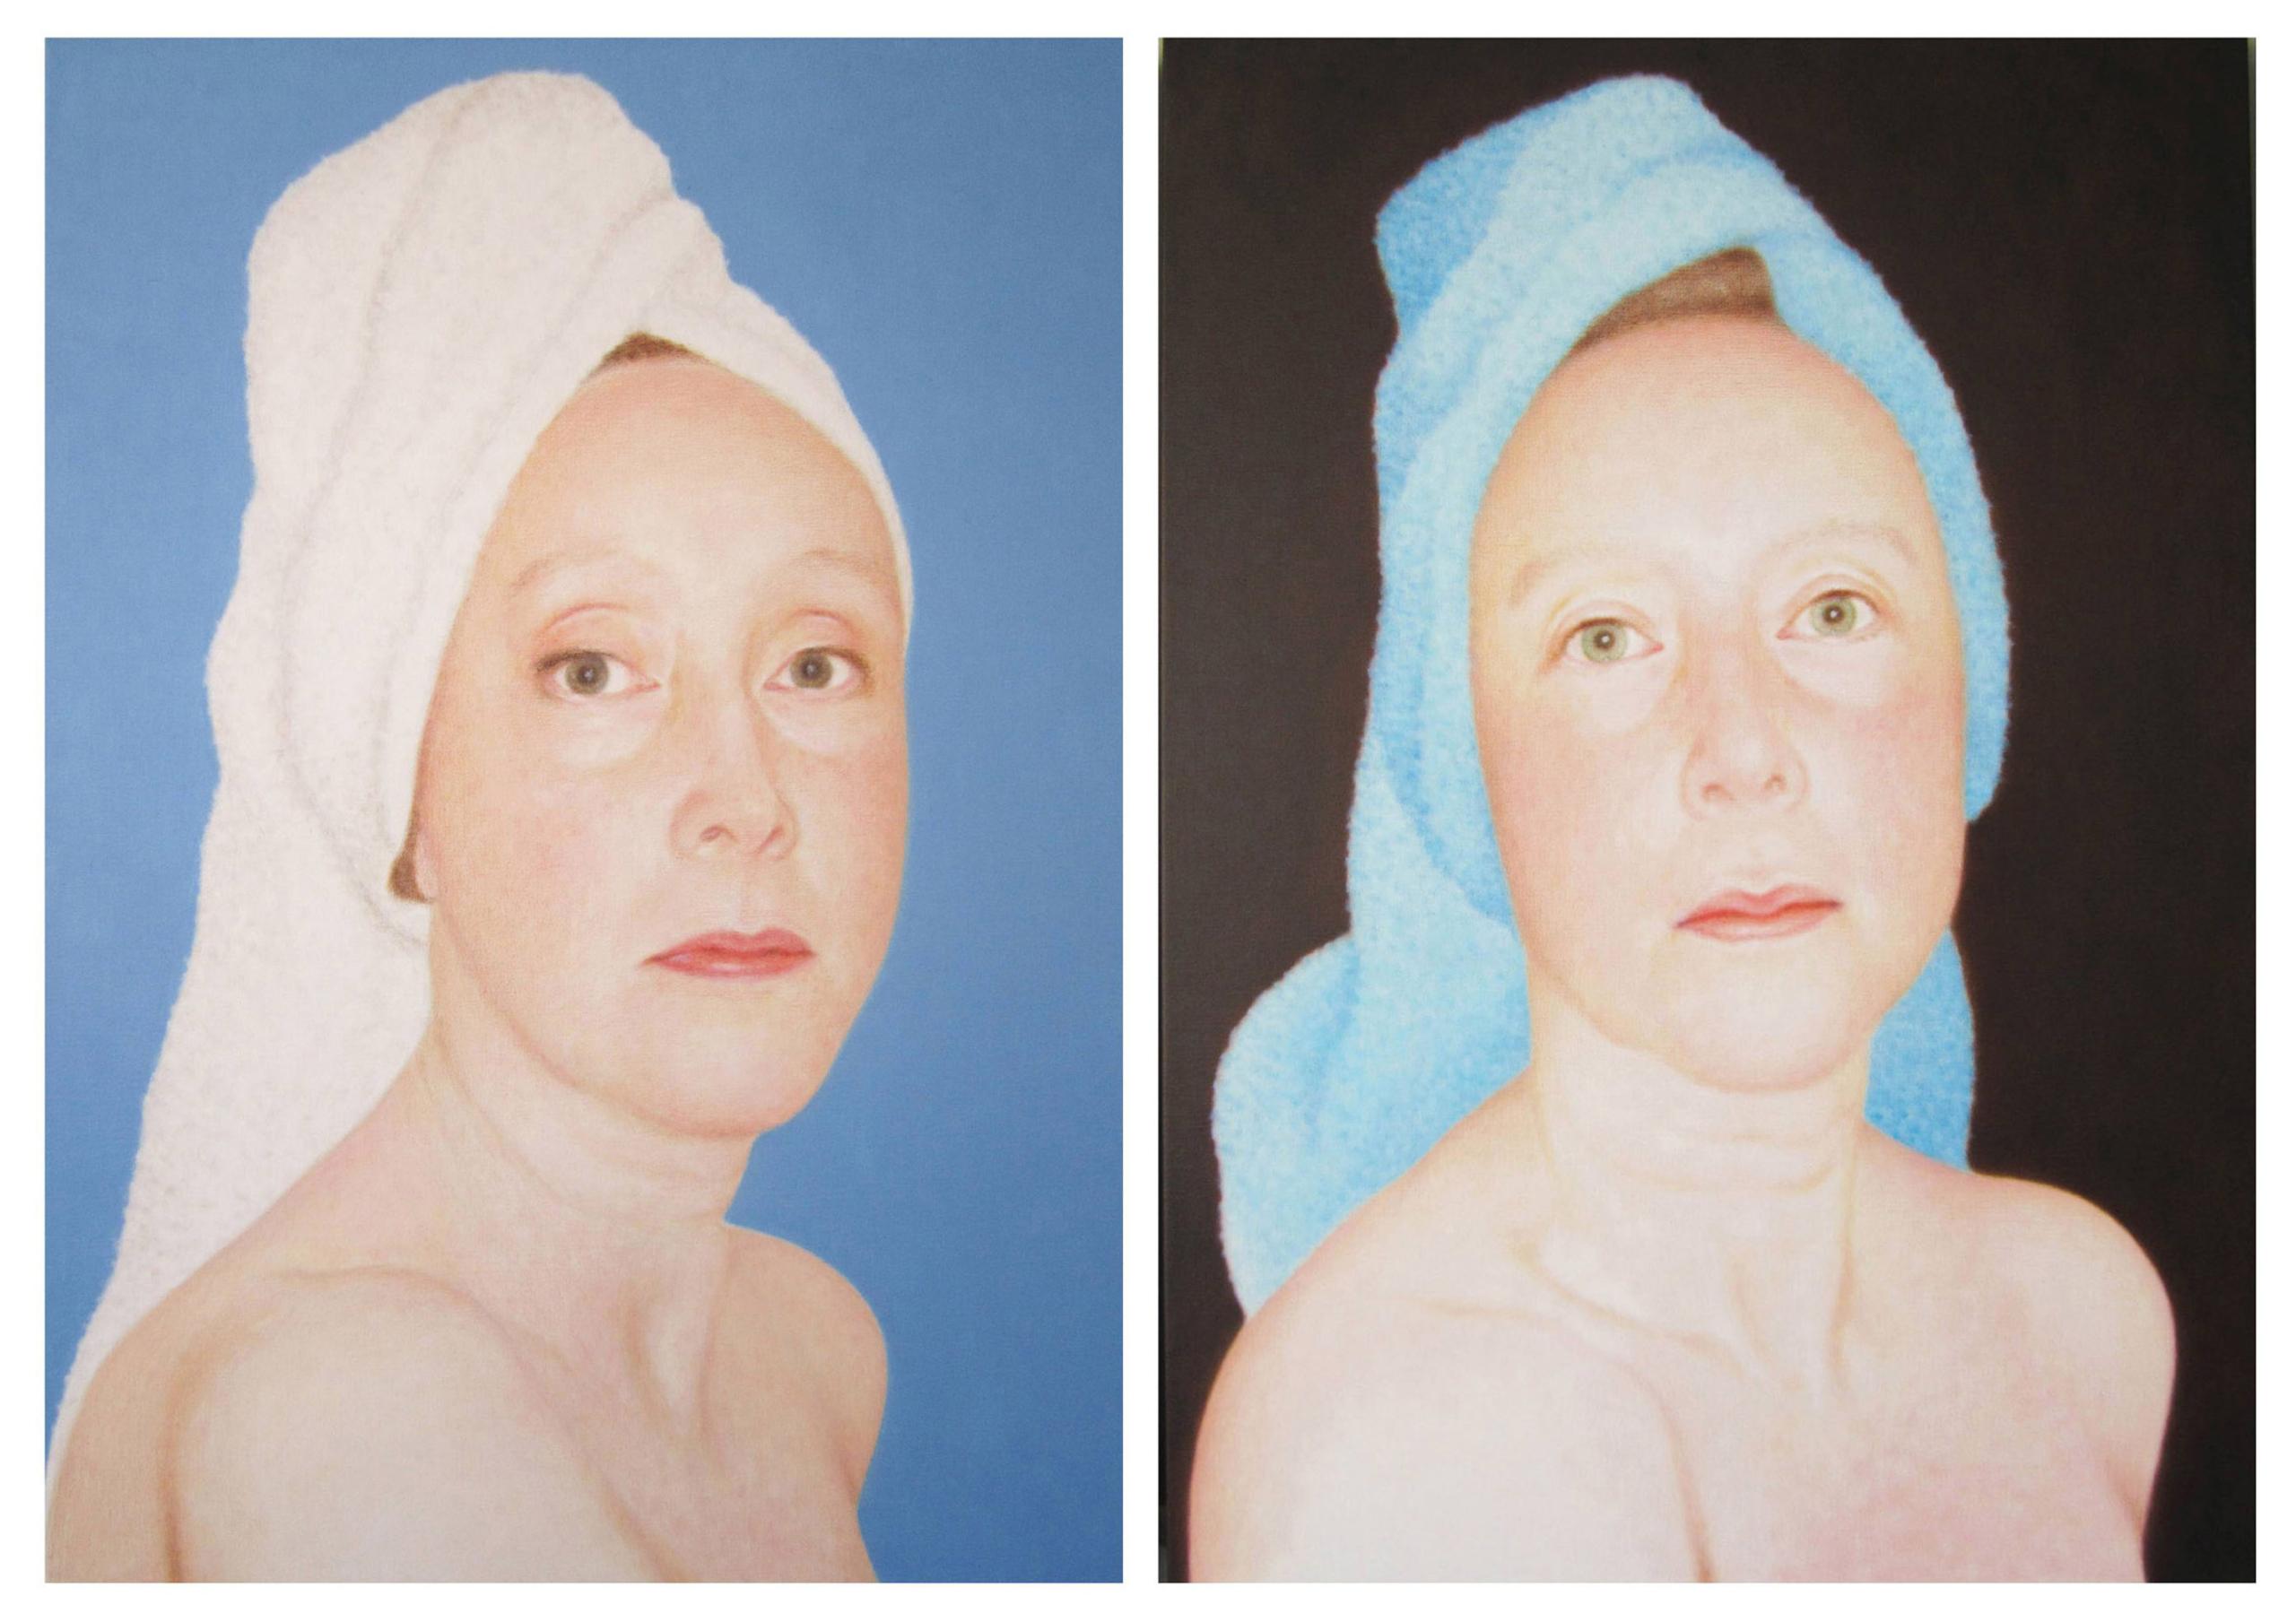 Self-portraits 19 01 23 and 15 09 14